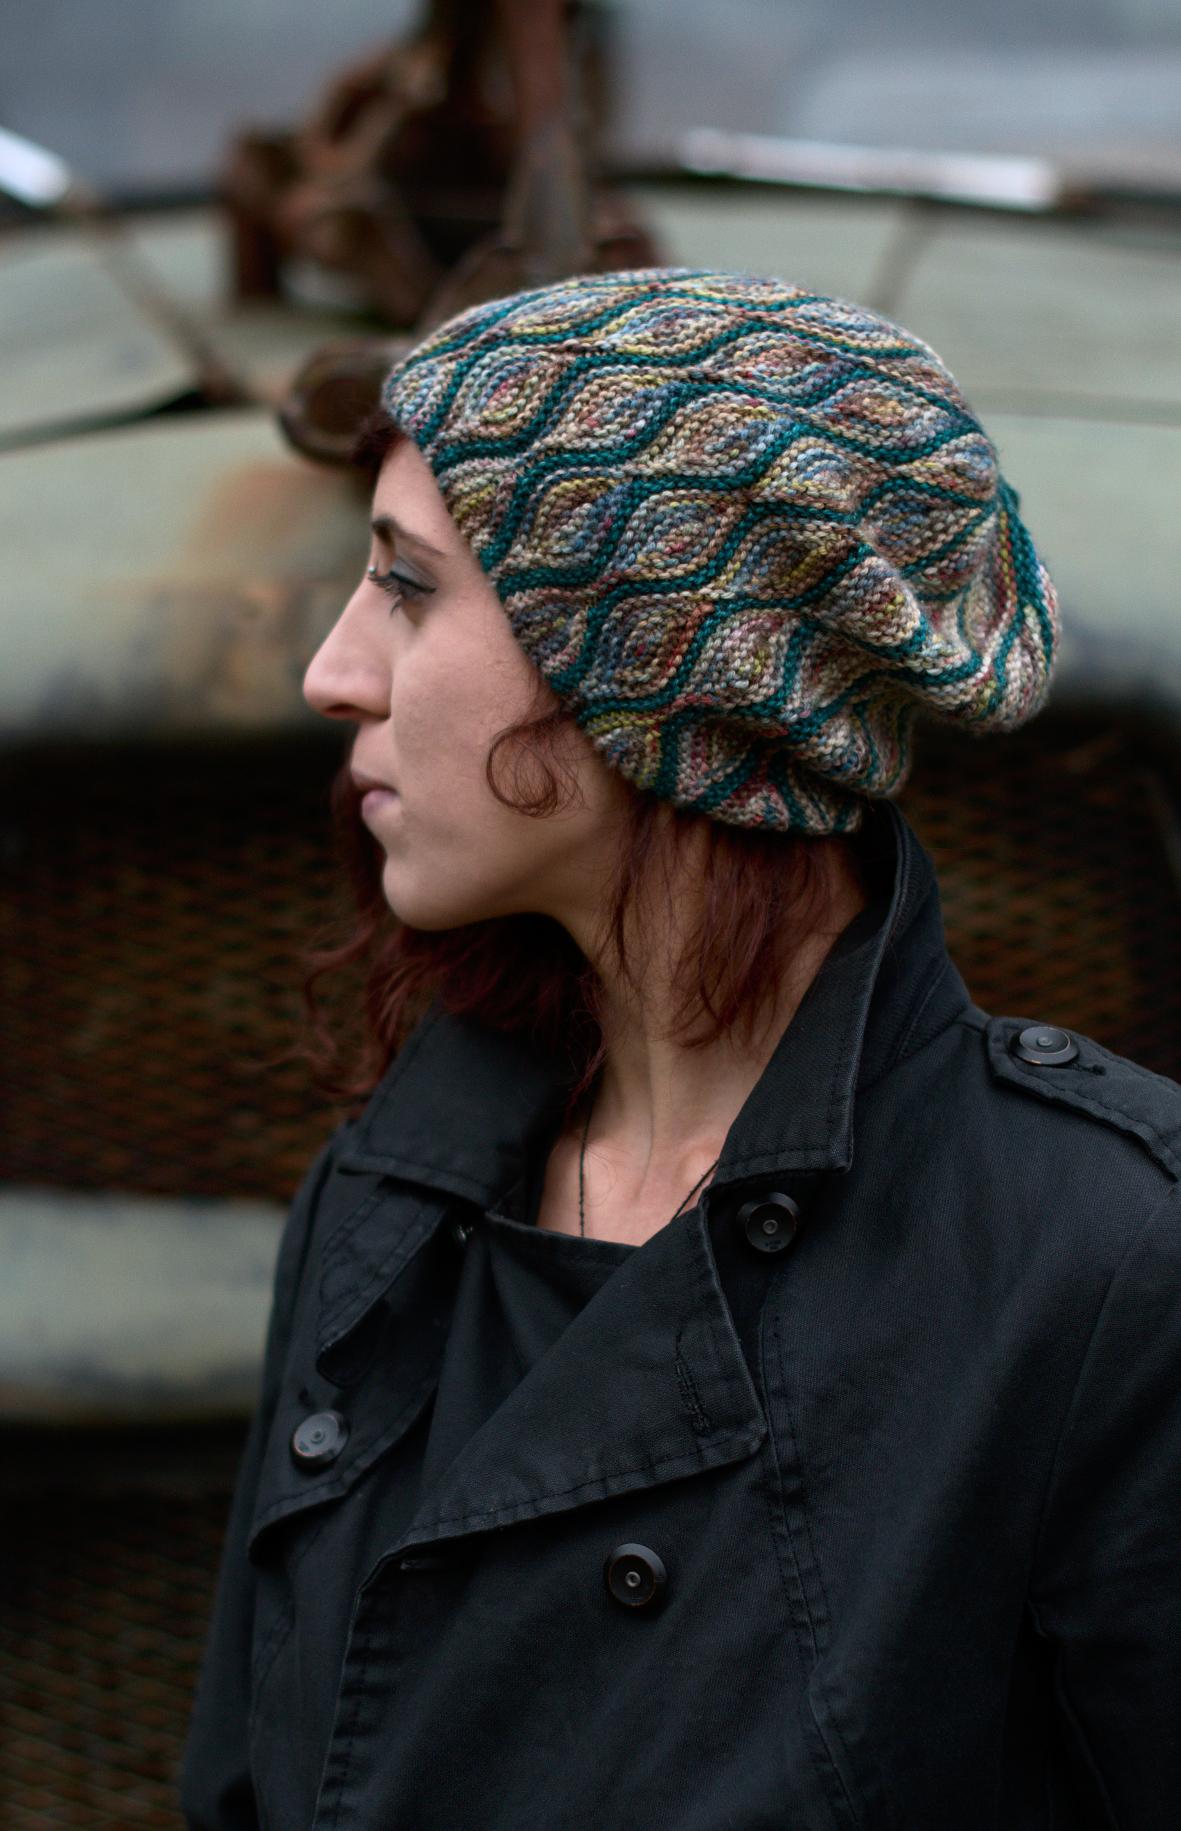 Rhinebeck hat sideways knit short row colourwork hand knitting pattern